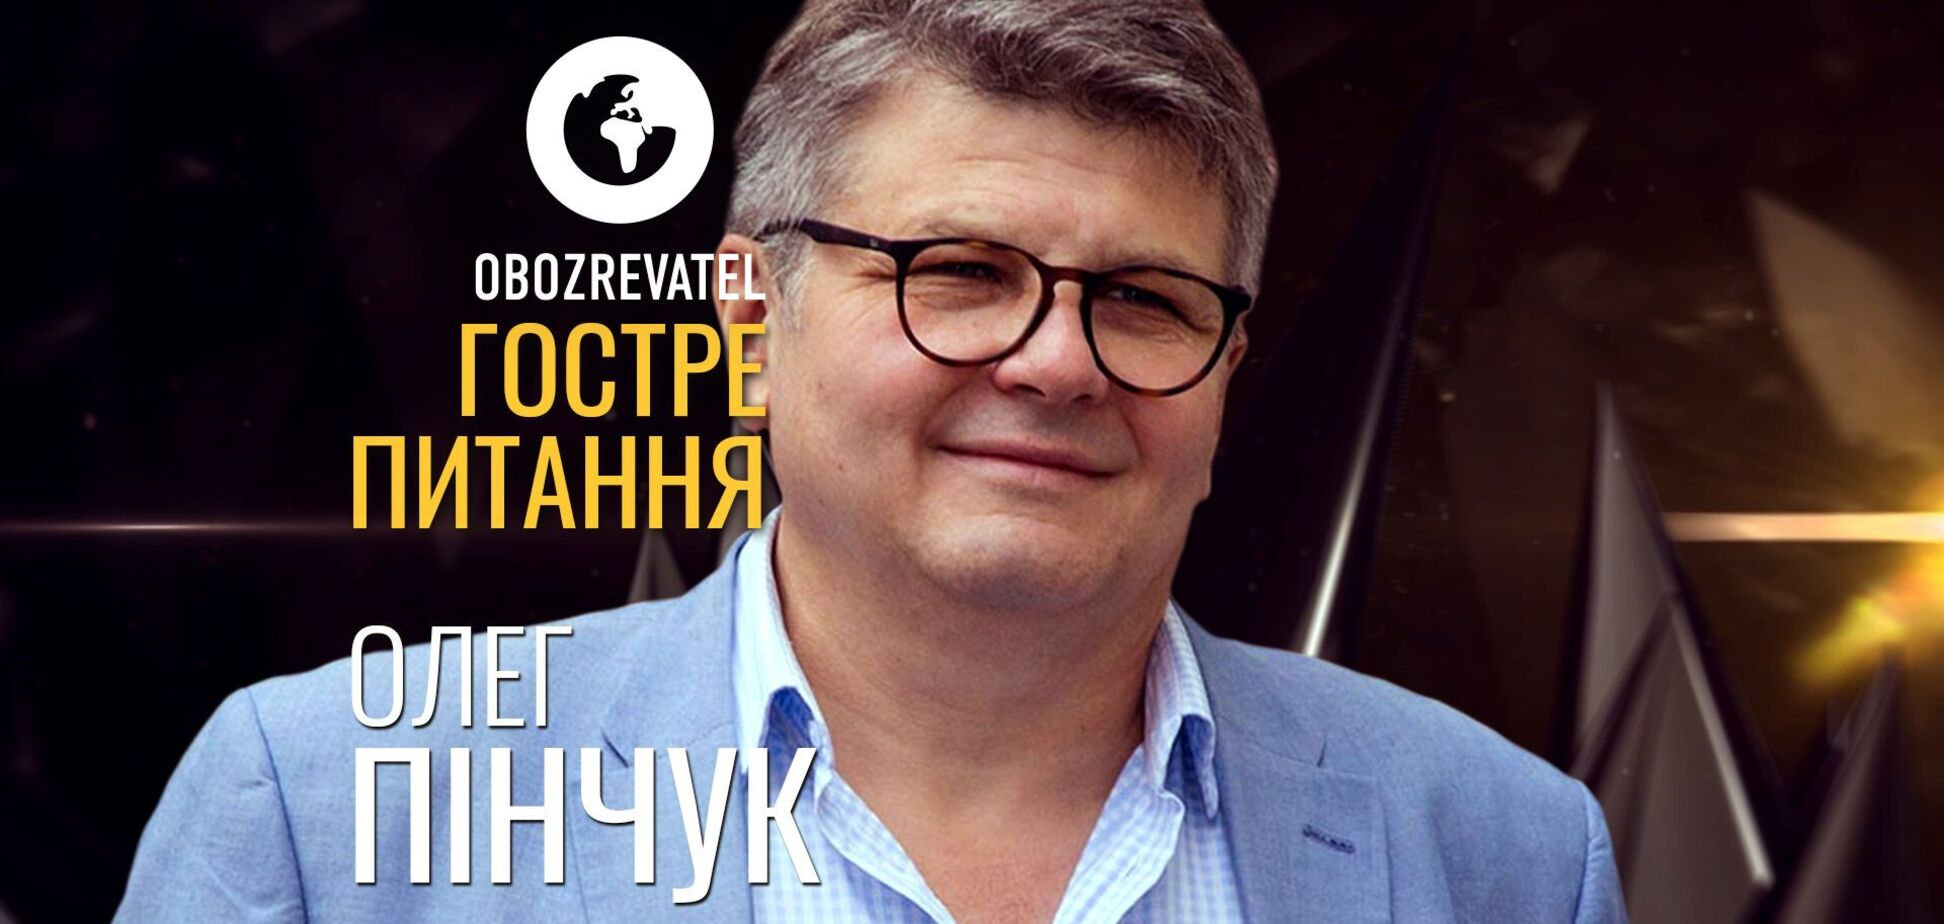 Олег Пинчук | Гостре питання